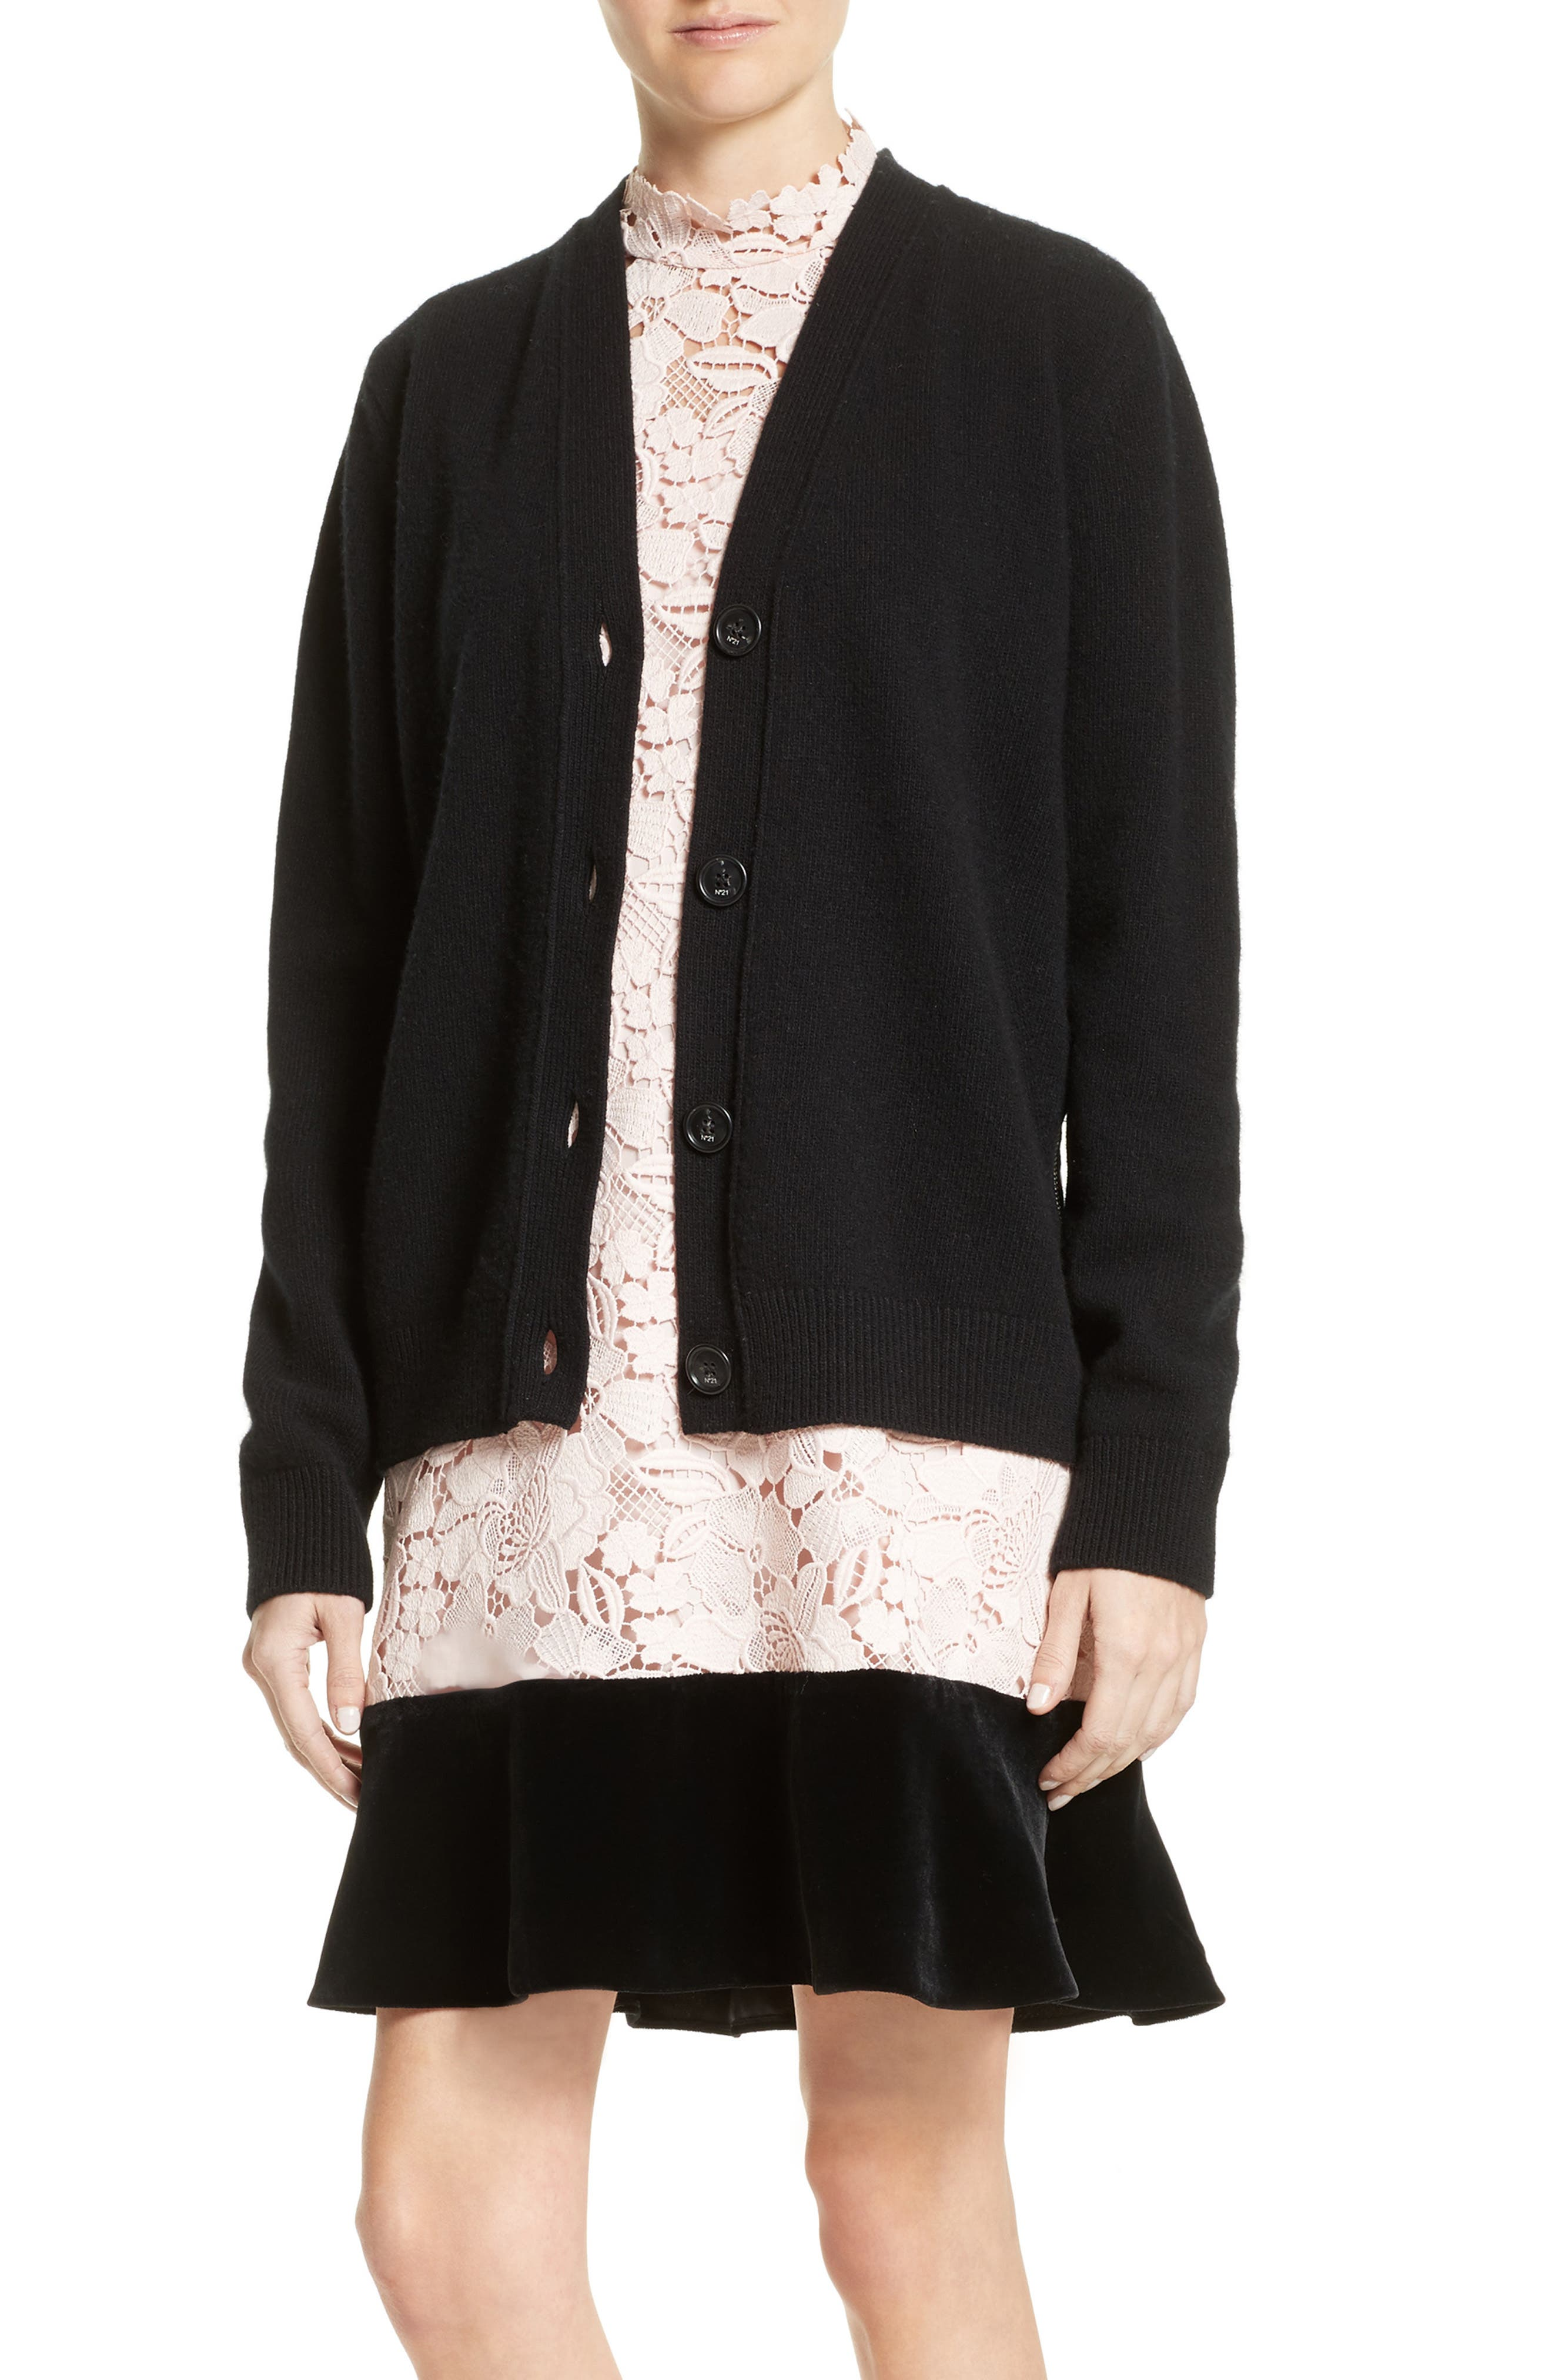 Alternate Image 1 Selected - N°21 Lace Back Wool Blend Cardigan